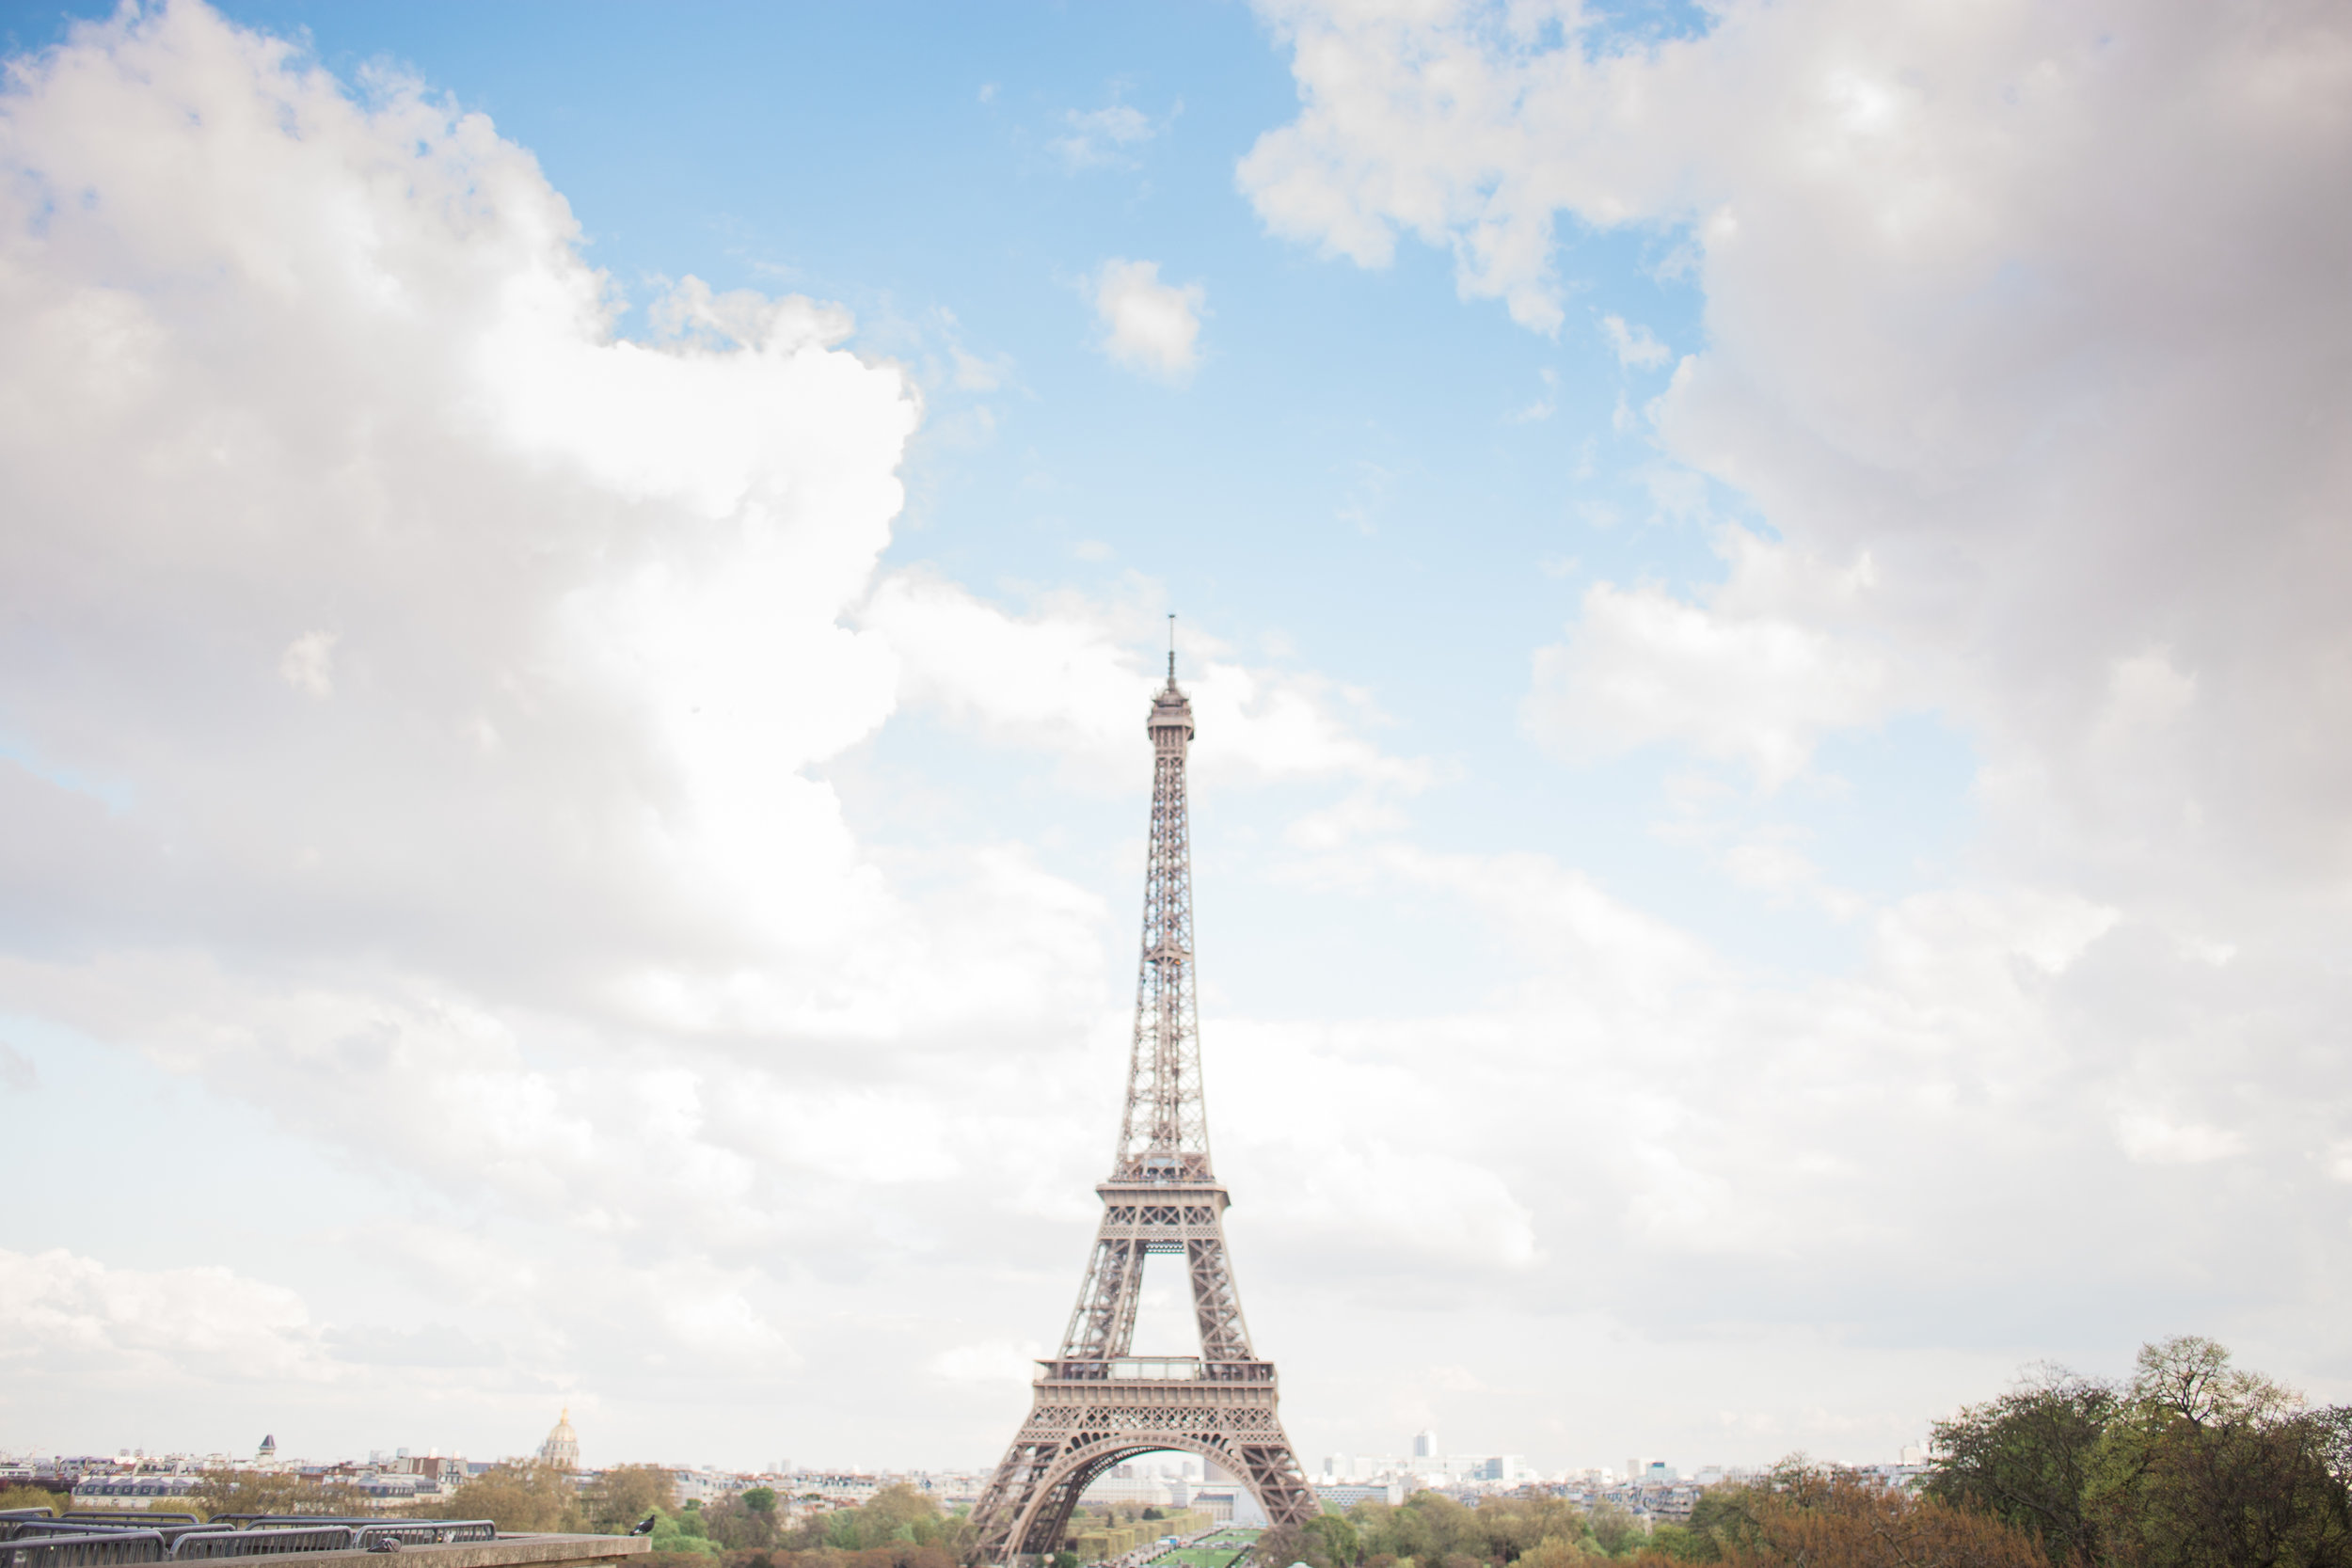 Eiffel Tower Paris France Photographer